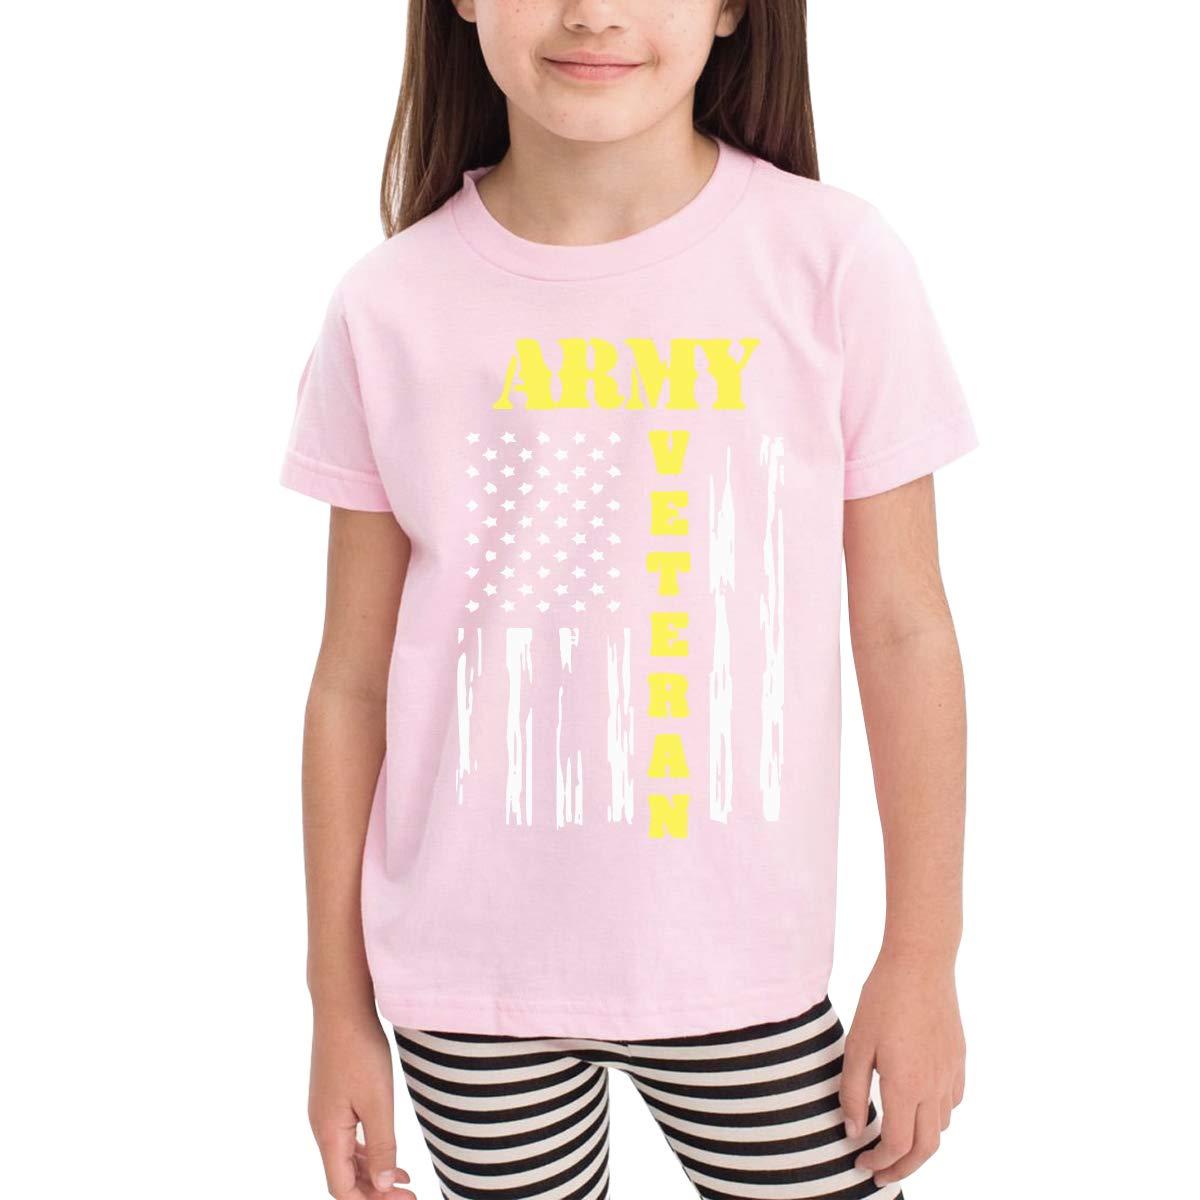 Kids T-Shirt Tops Black Army Veteran Unisex Youths Short Sleeve T-Shirt